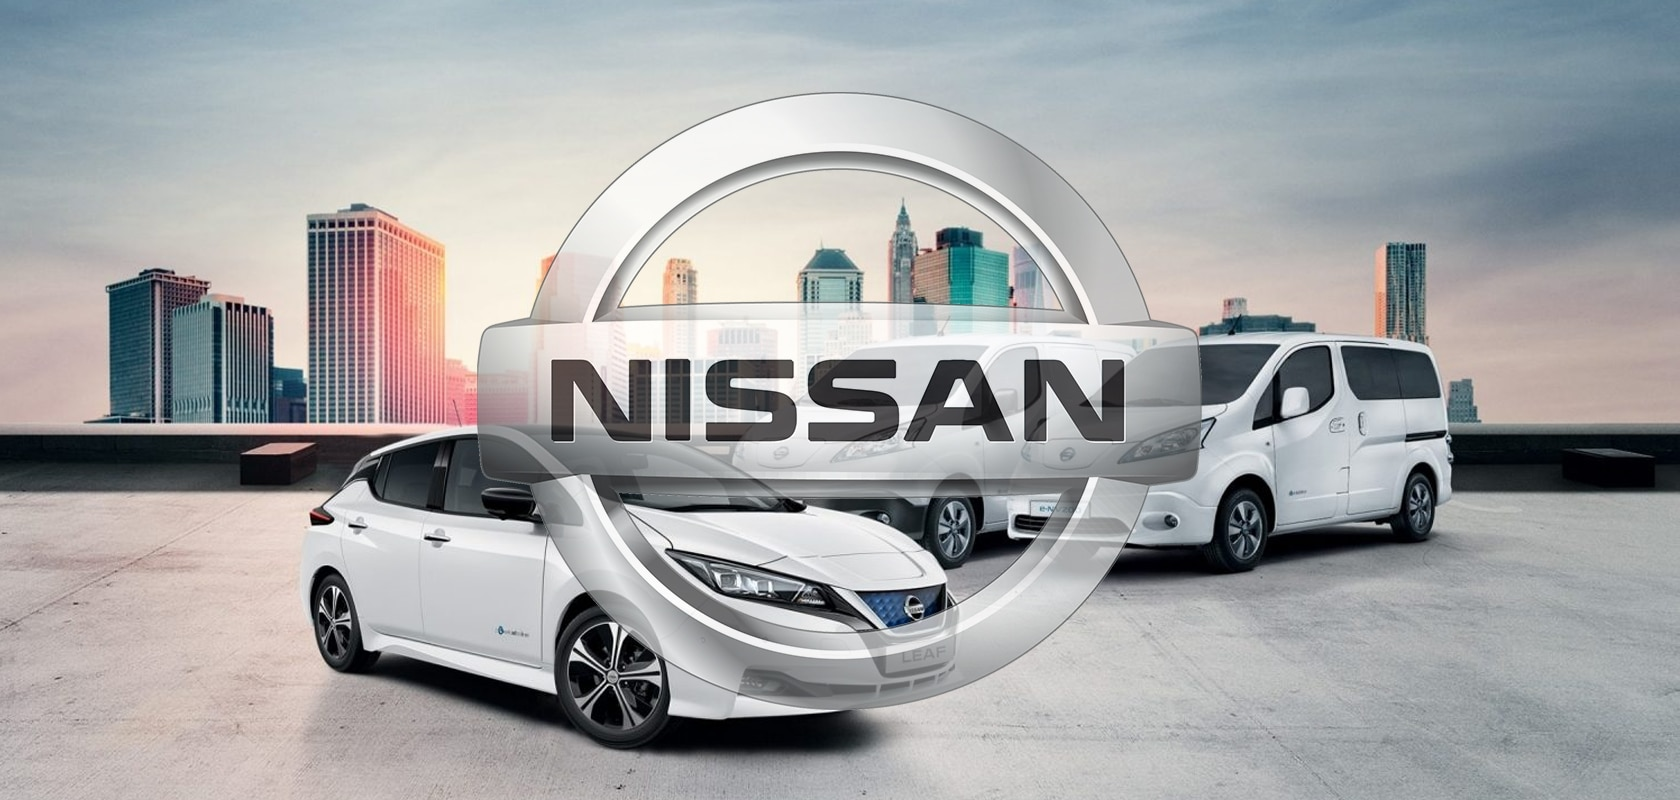 Marque Nissan